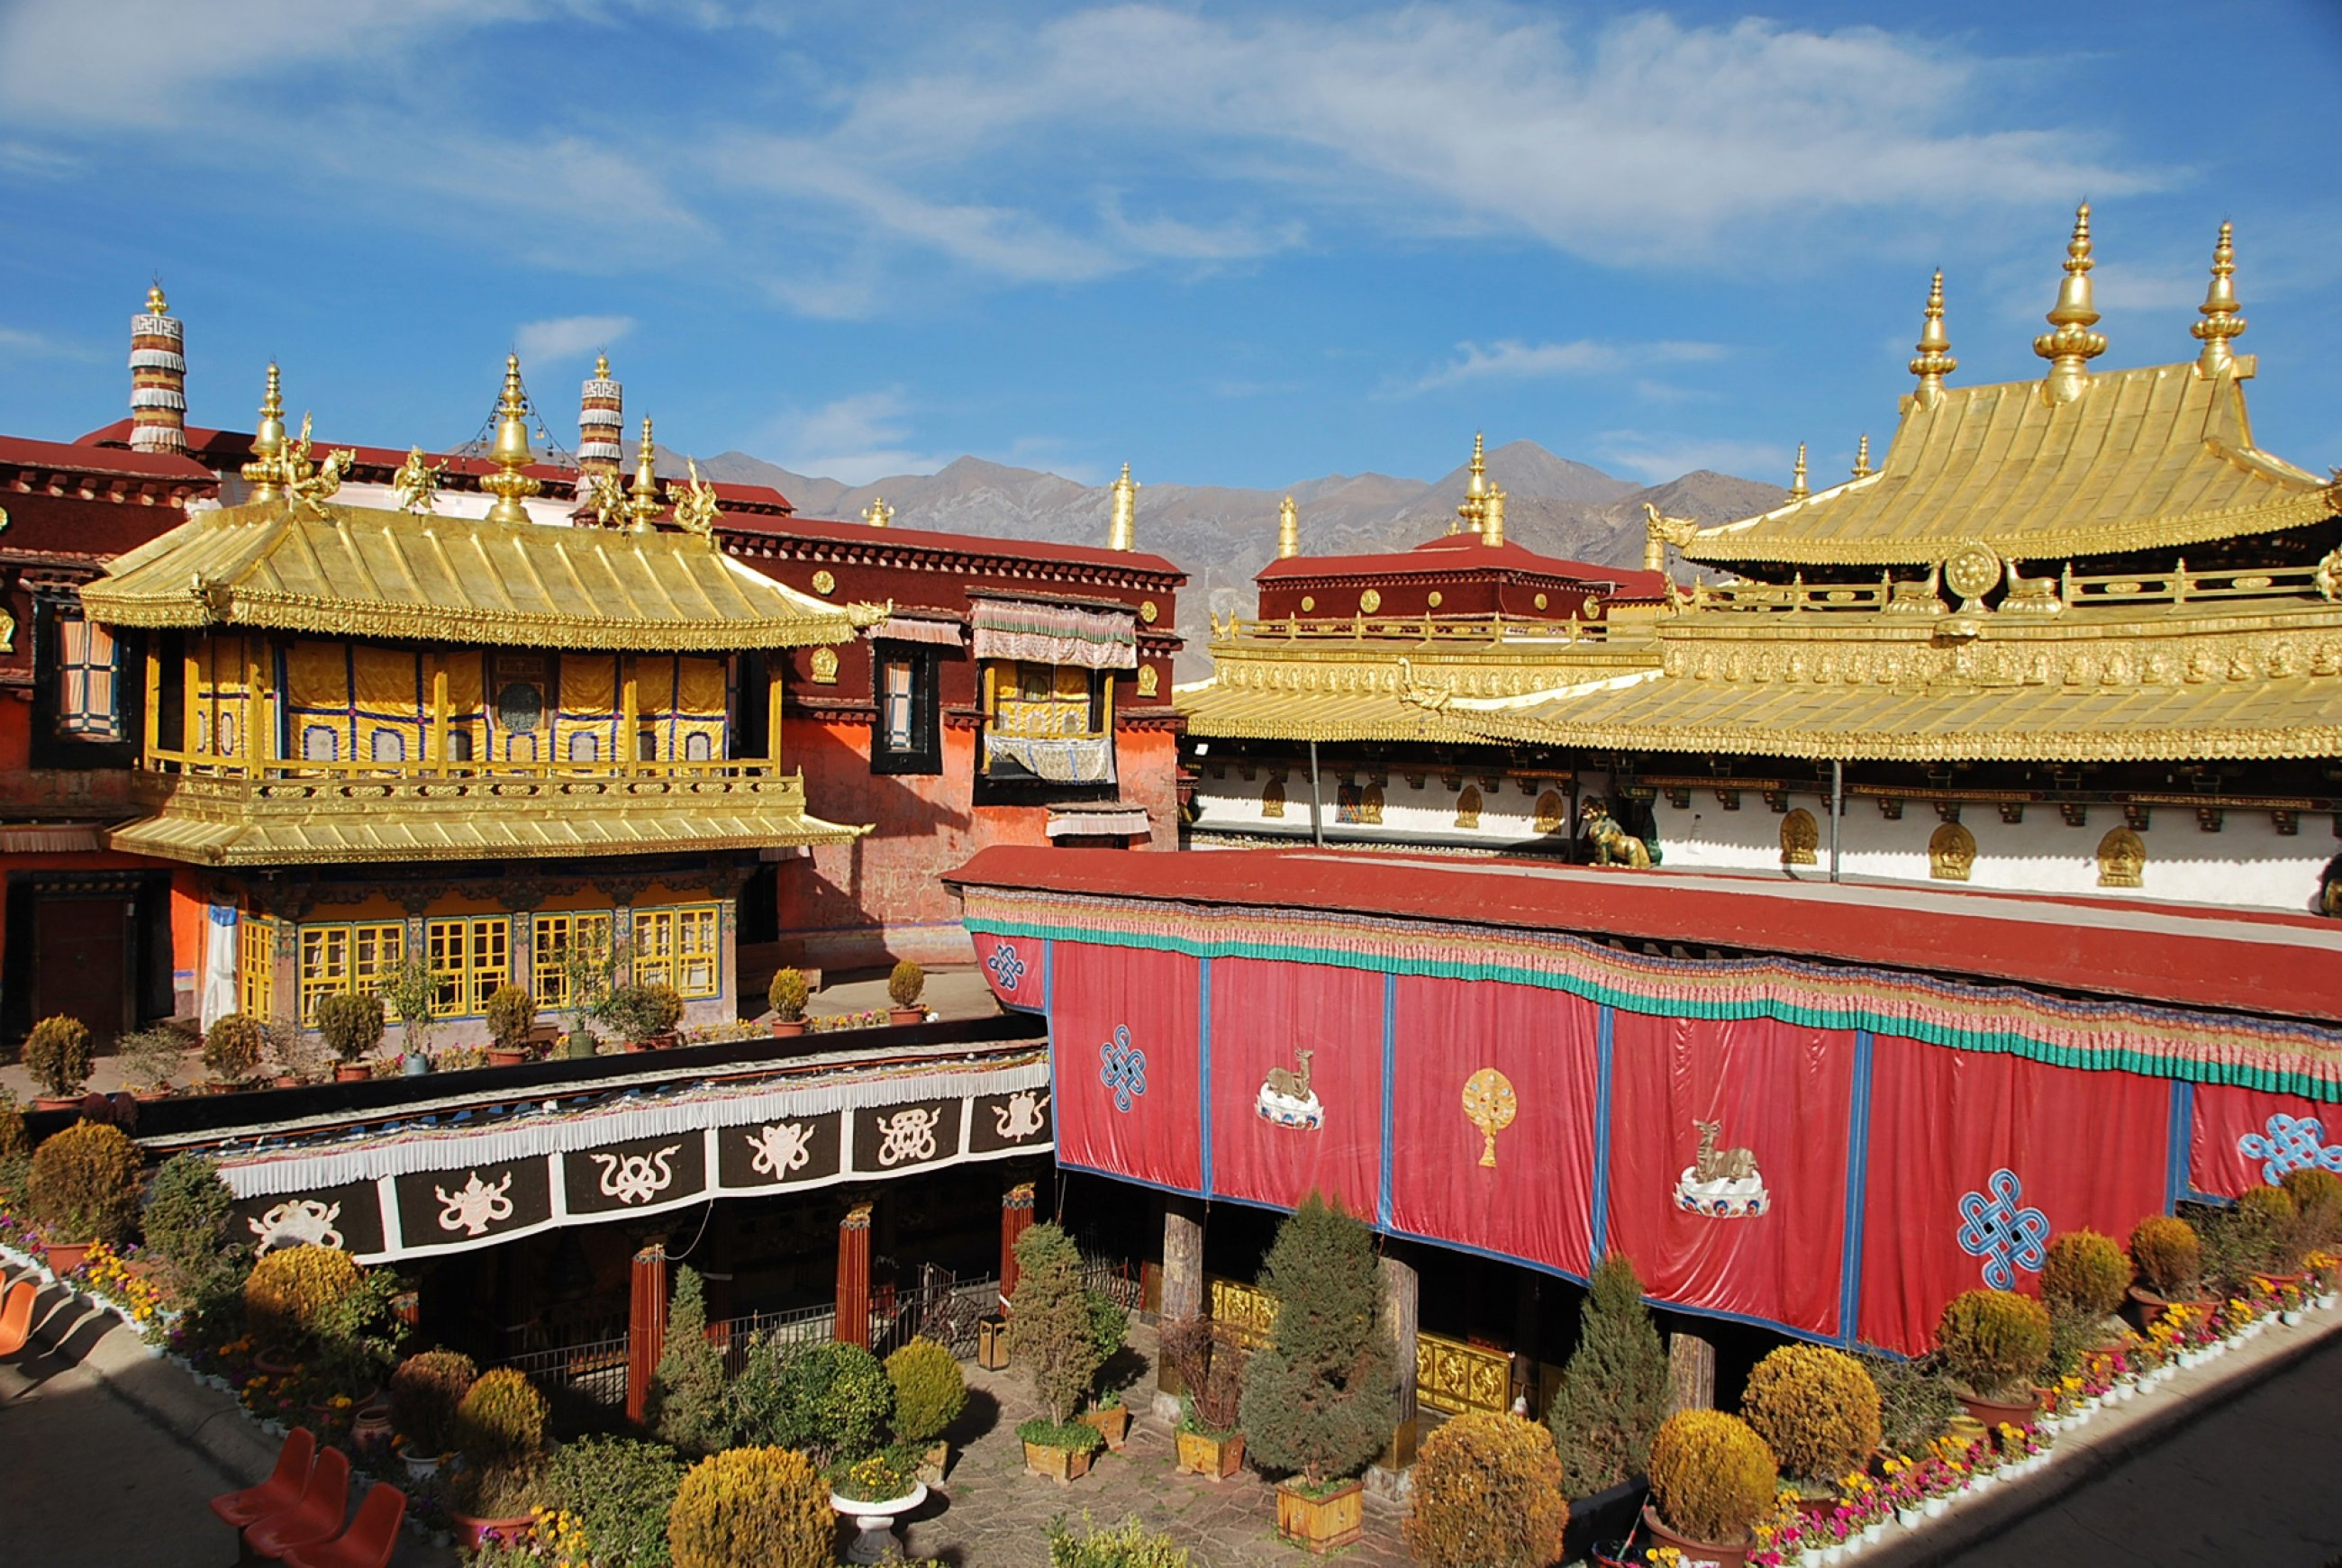 https://bubo.sk/uploads/galleries/3467/tibet-lhasa-ctni-11-2014-mirka-sulka-128-.jpg